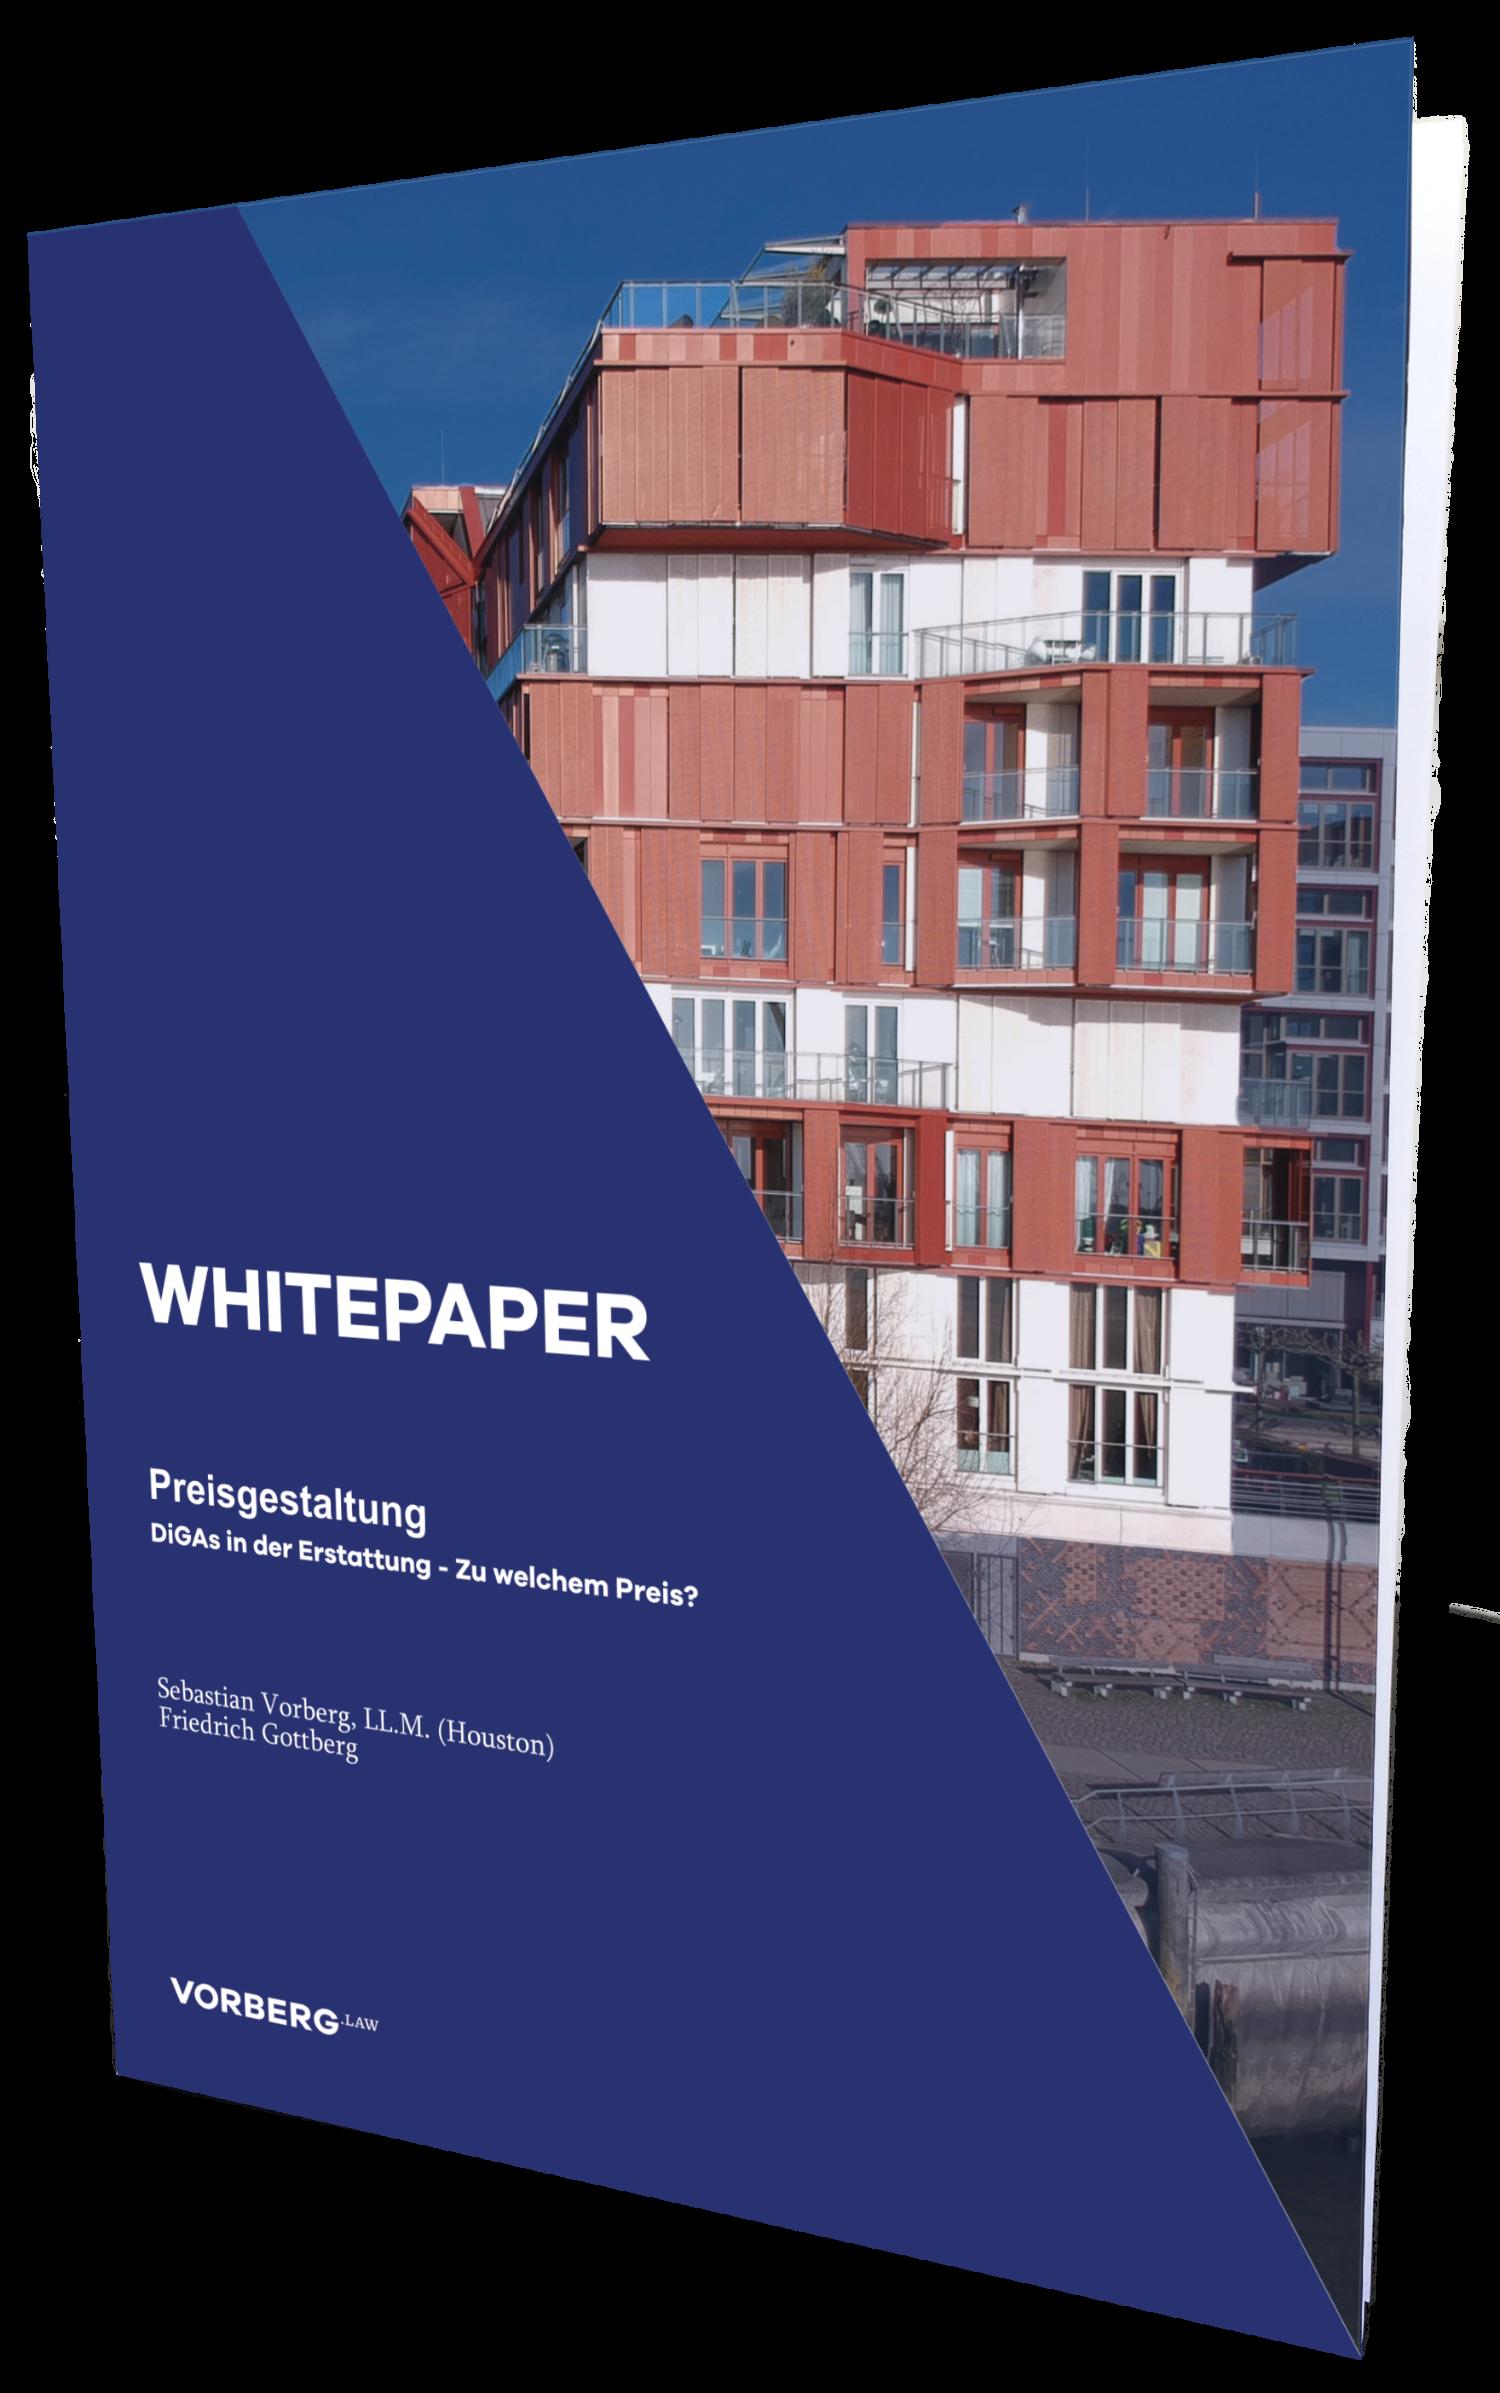 Stockbild_Whitepaper Preisgestaltung